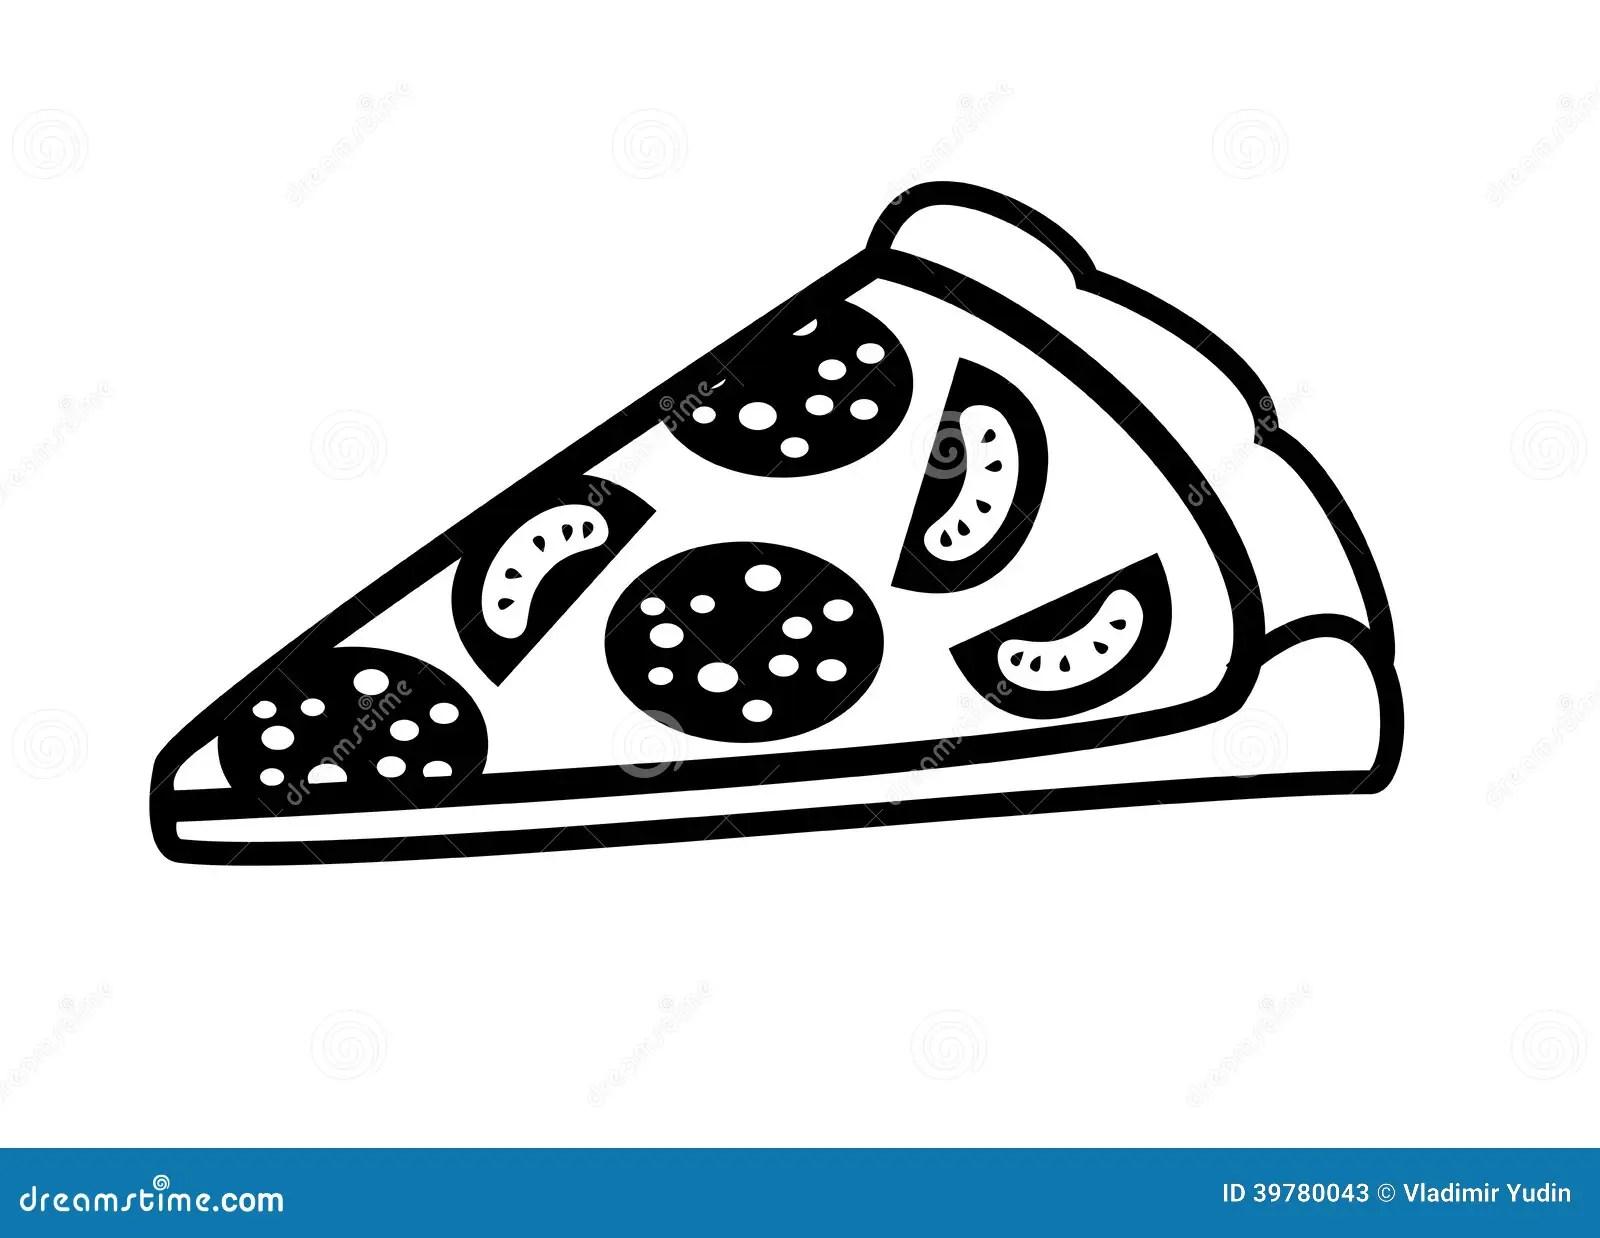 Piece Of Pizza Stock Vector Illustration Of Cartoon